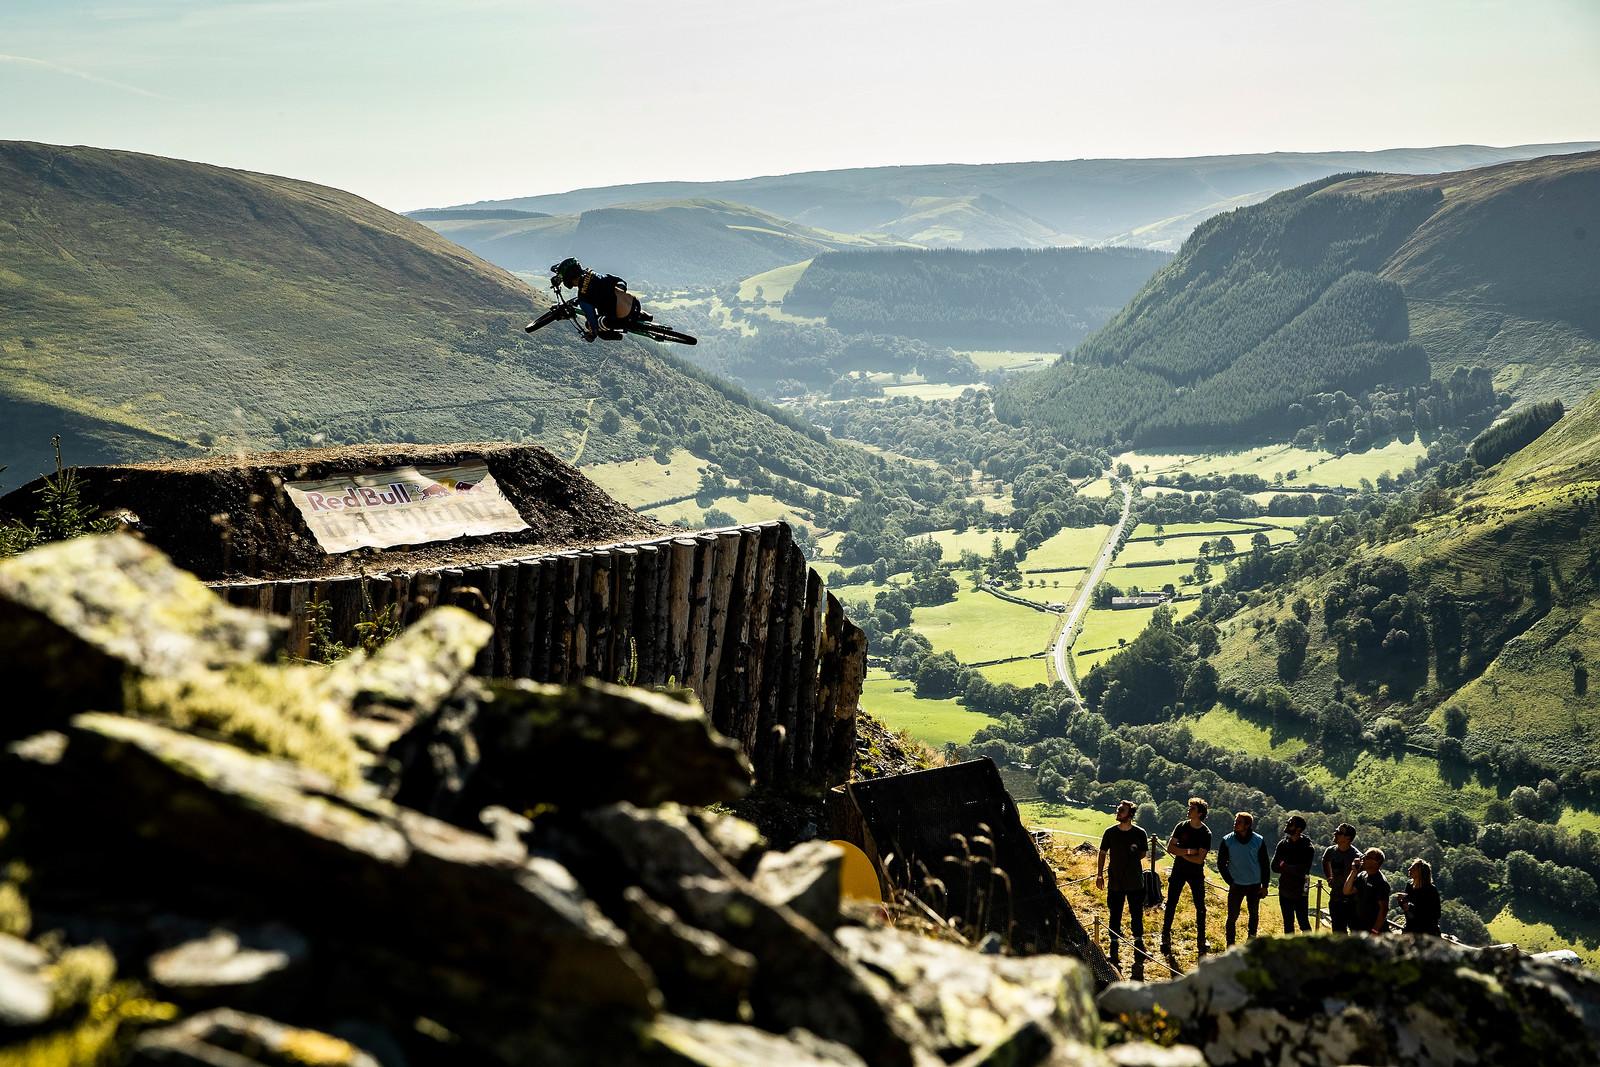 Dave McMillan - Red Bull Hardline in Photos - Mountain Biking Pictures - Vital MTB